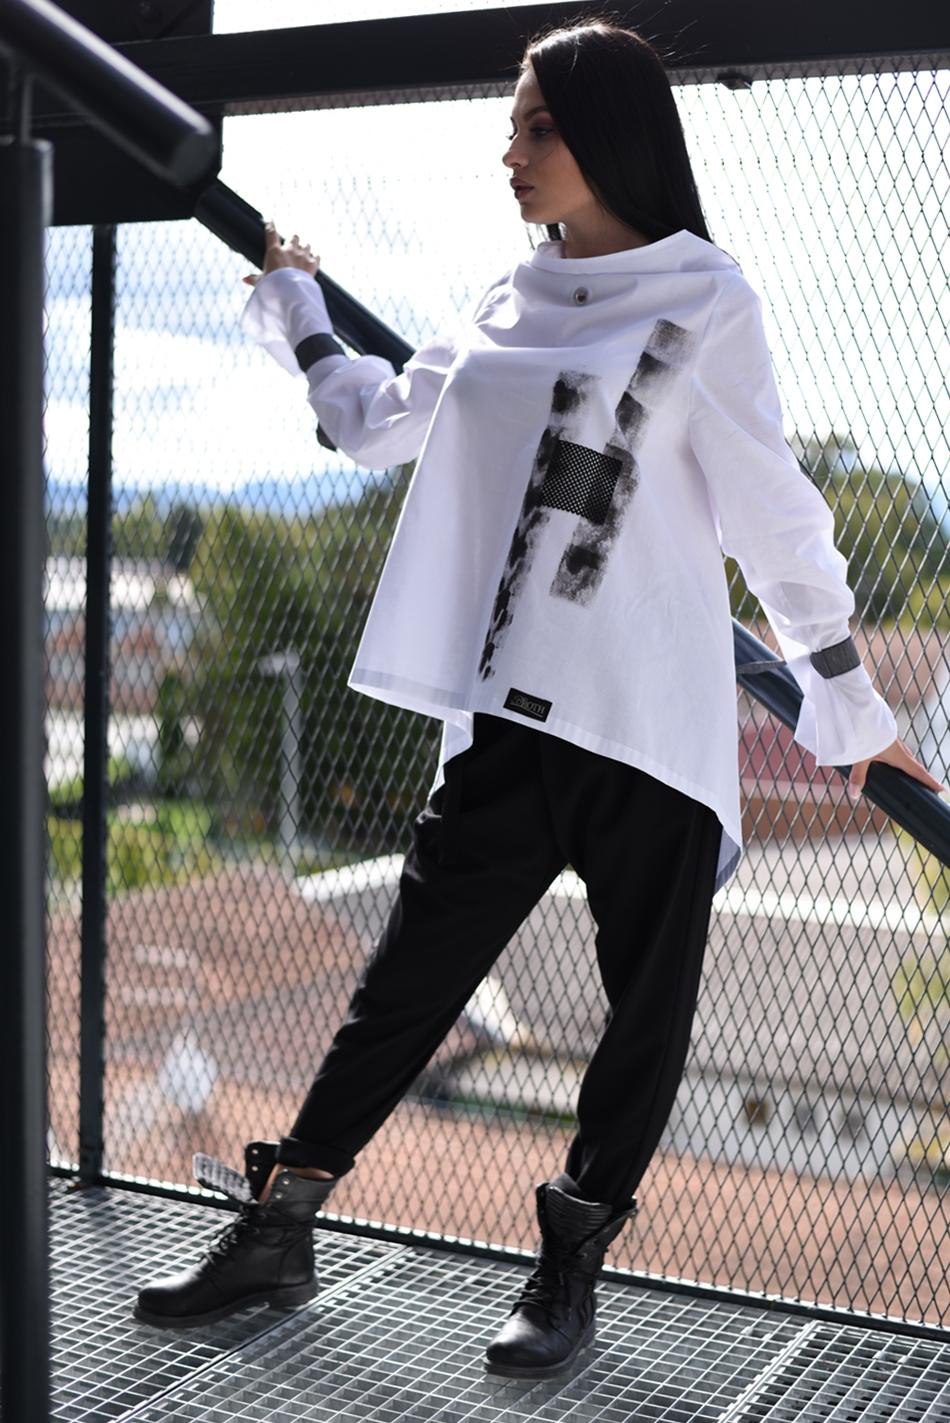 Broth_design_clothes_010